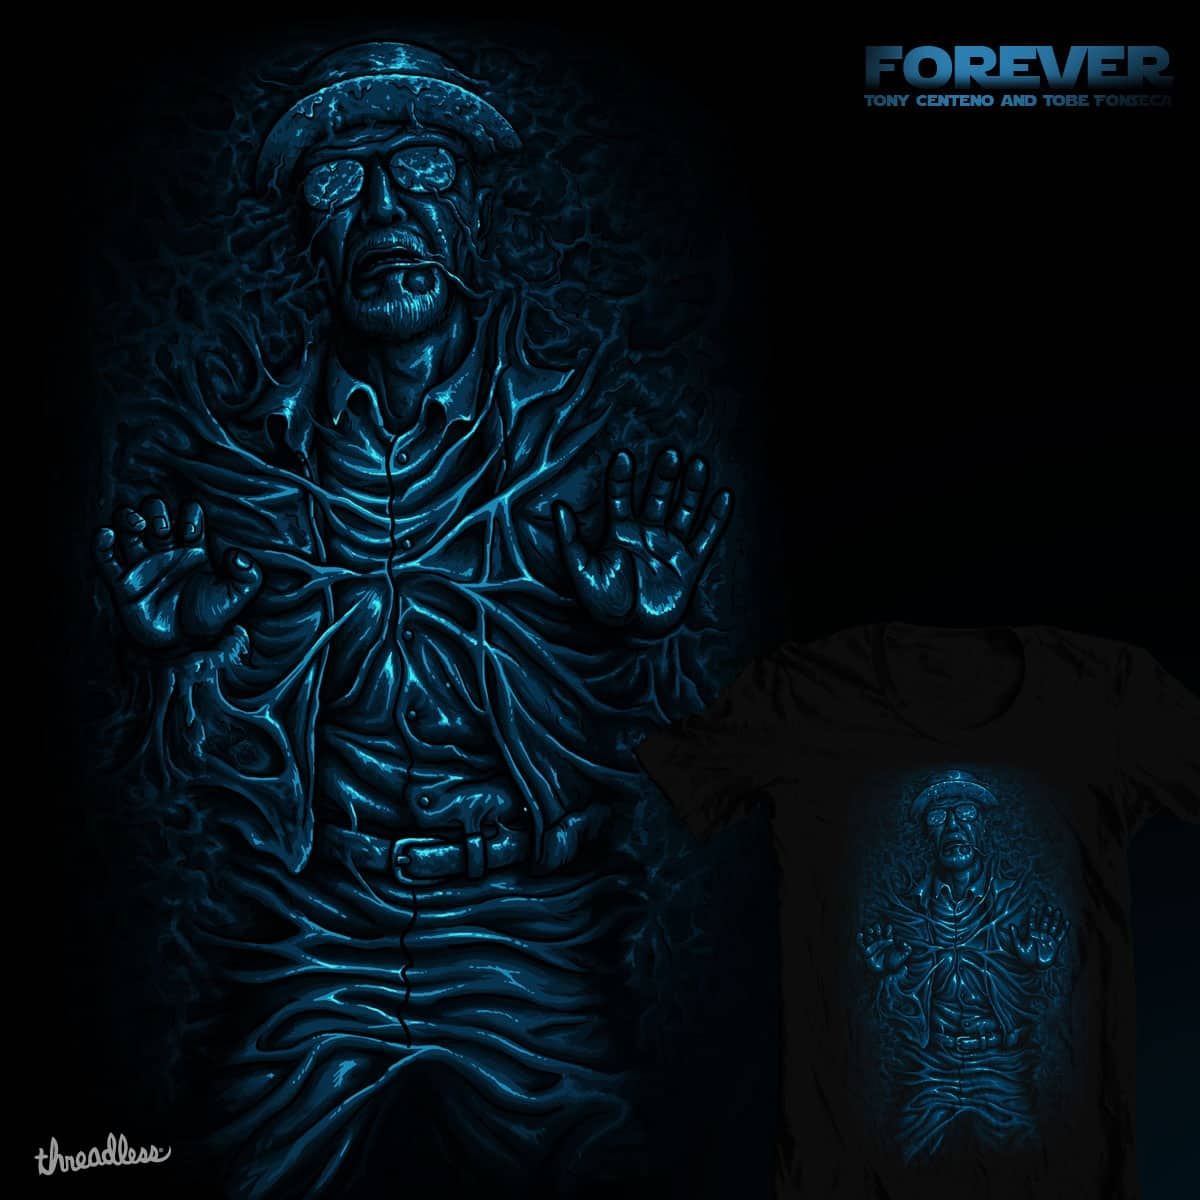 Forever! by tobiasfonseca and Tony Centeno on Threadless